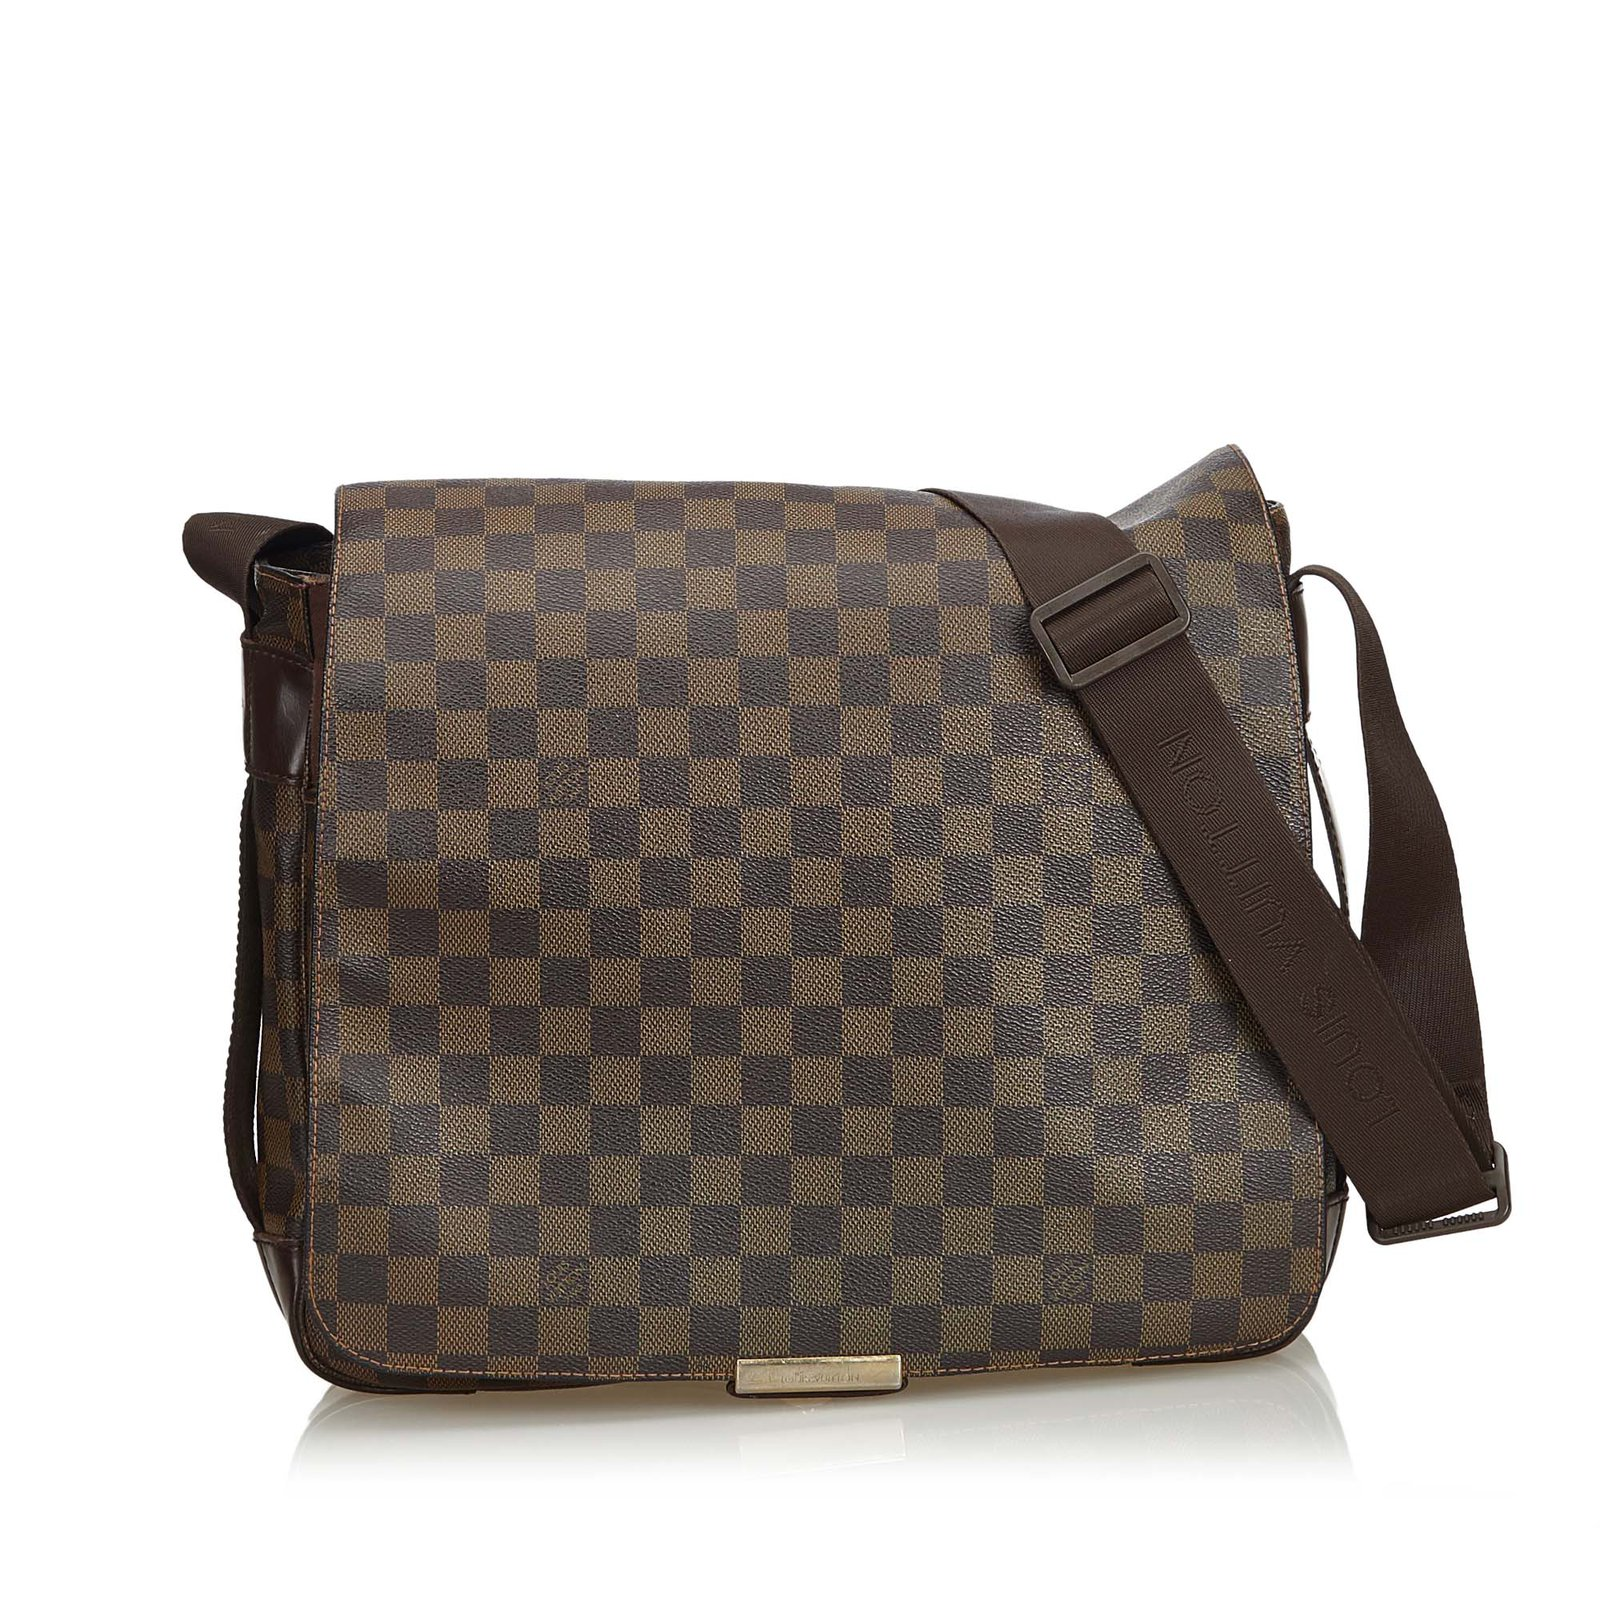 f75ae7ffbcf8 Louis Vuitton Damier Ebene Bastille Messenger Bag Handbags Leather ...